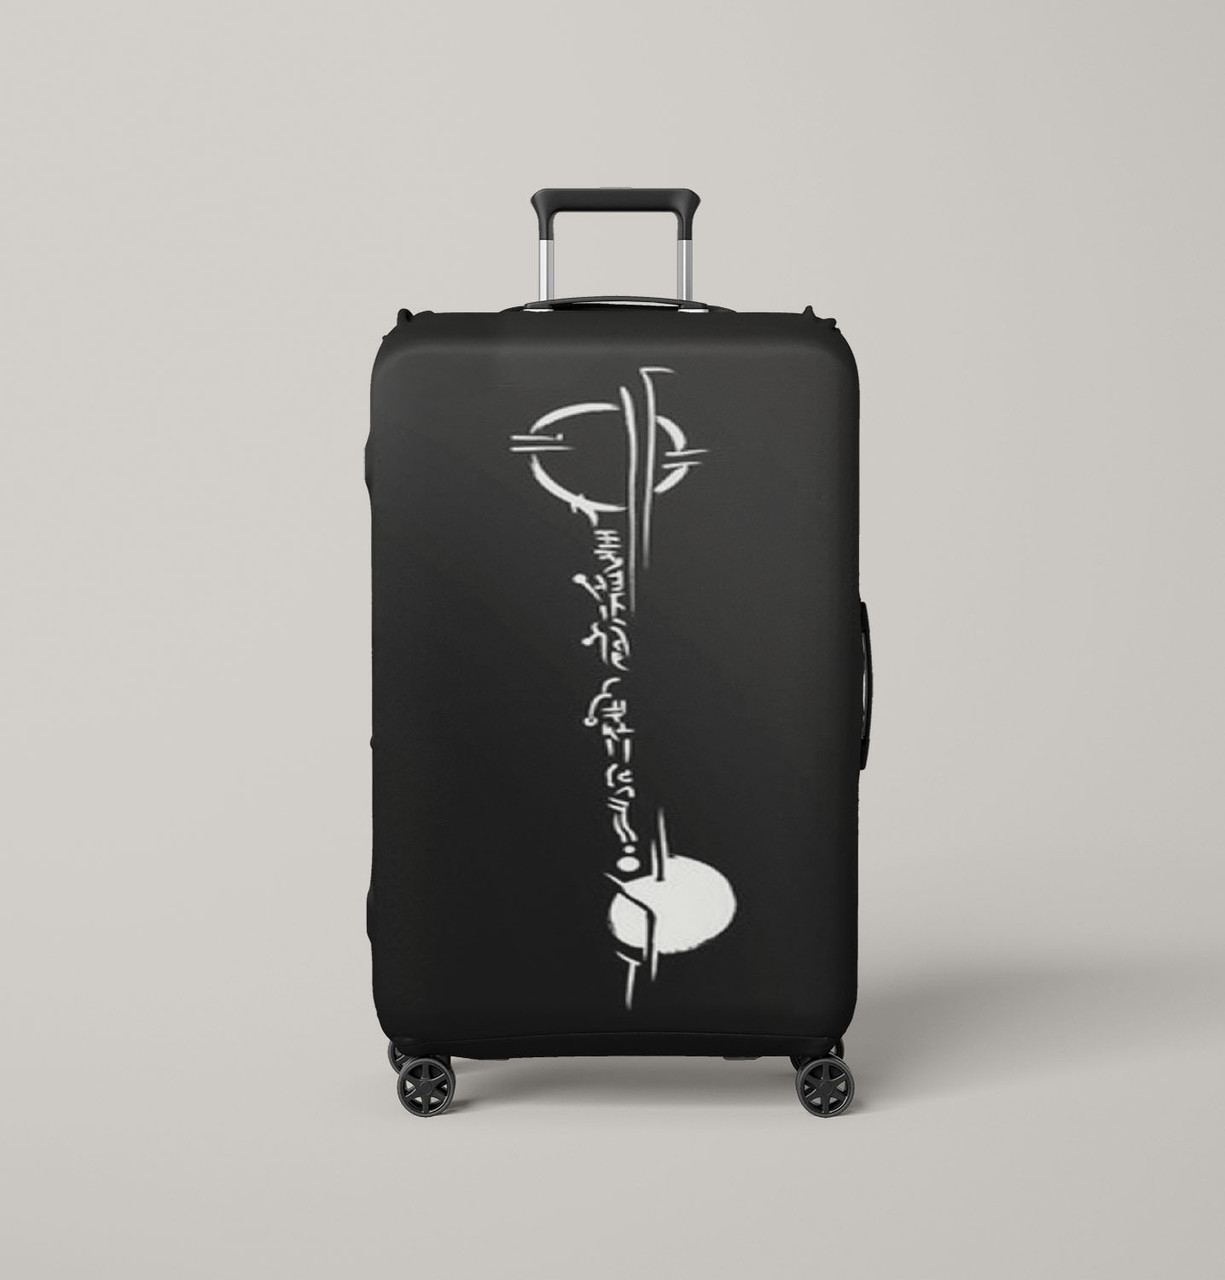 Lexa Tattoo The 100 Black Luggage Cover